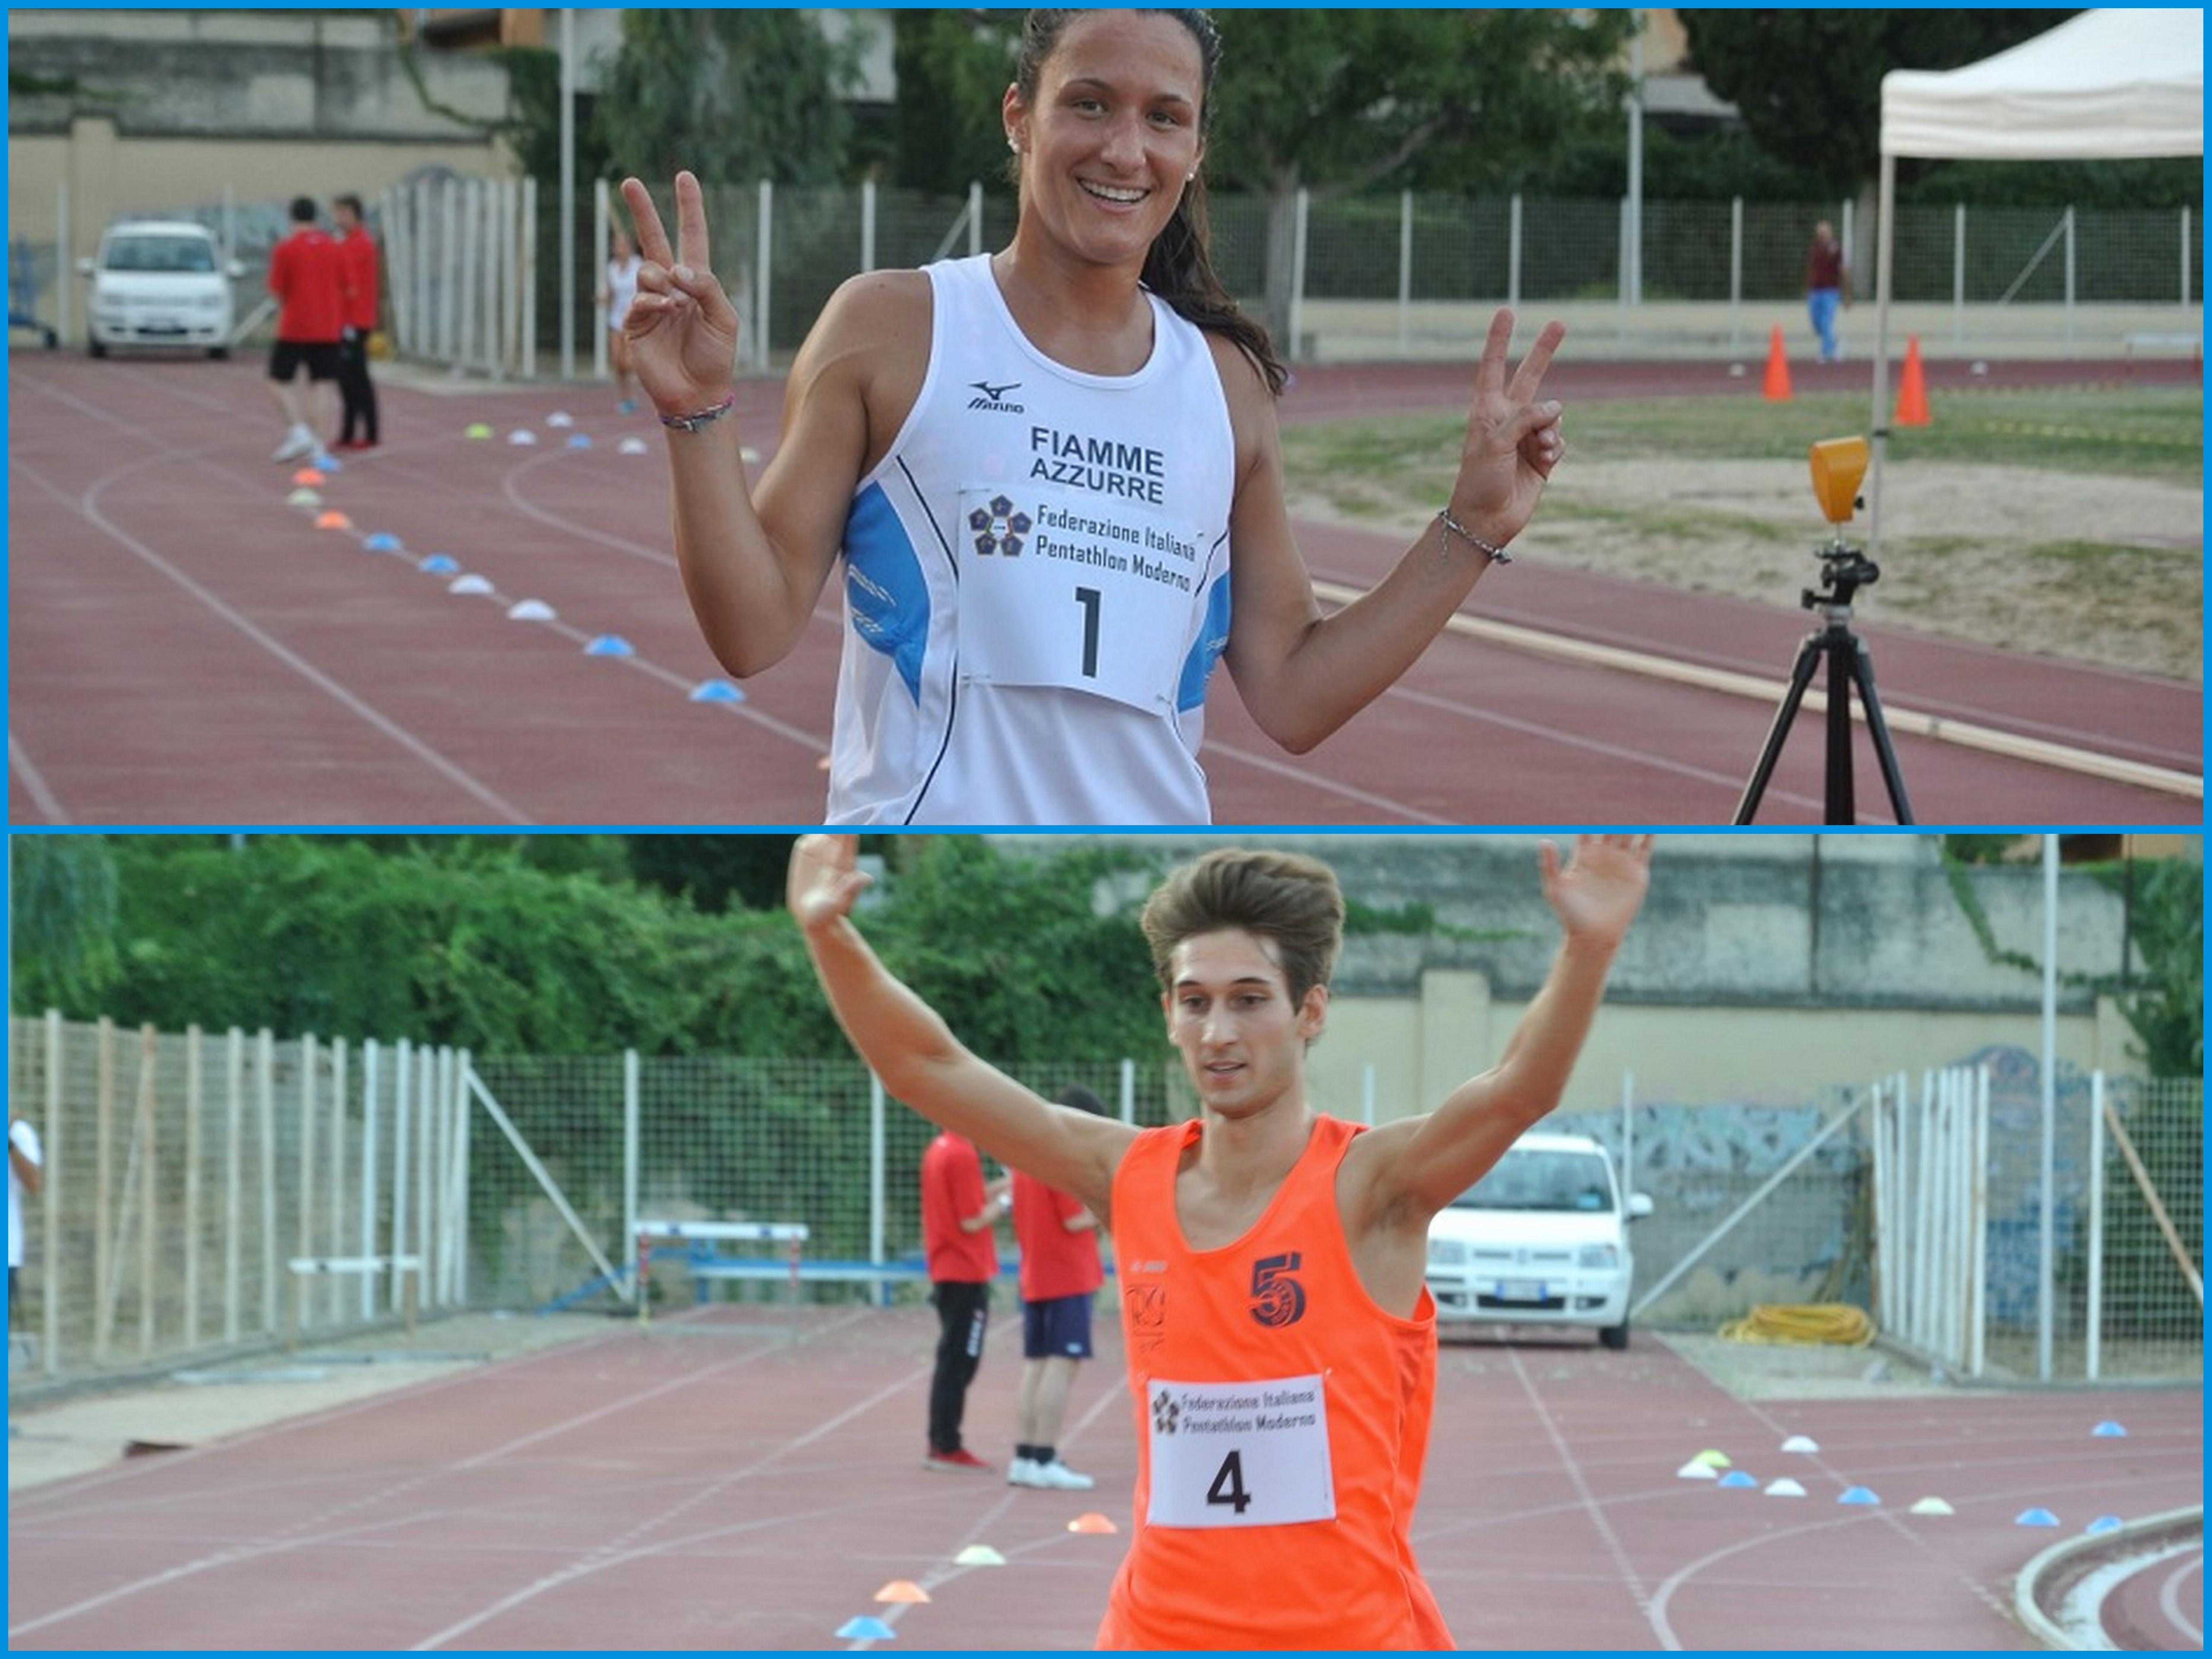 gloria tocchi giuseppe mattia parisi campioni pentathlon campionato italiano assoluto open 2017 pentathlon moderno italia nazionale